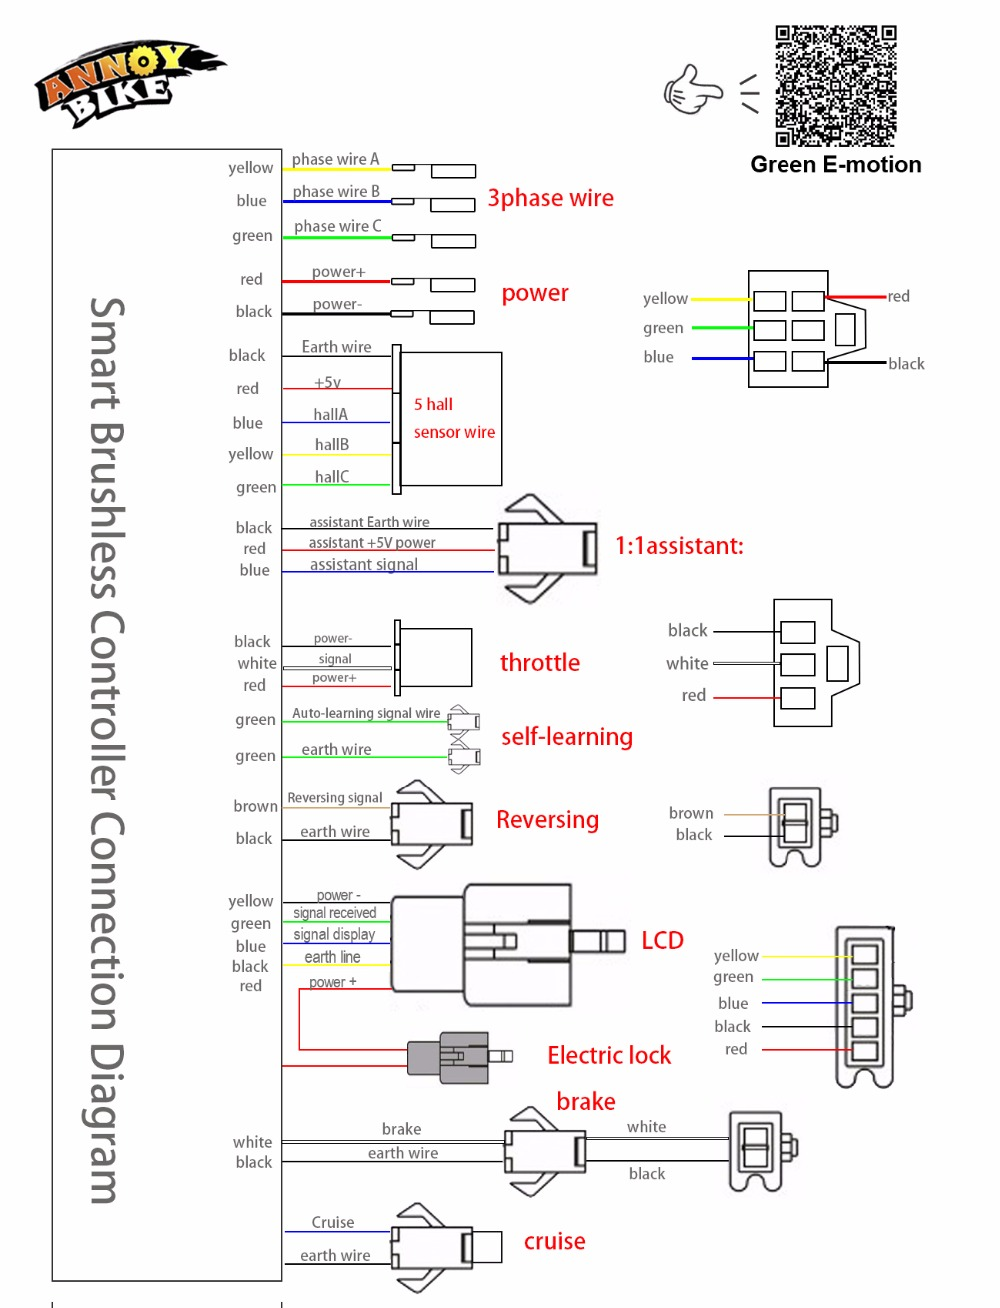 electric bicycle wiring diagram wiring diagram. Black Bedroom Furniture Sets. Home Design Ideas